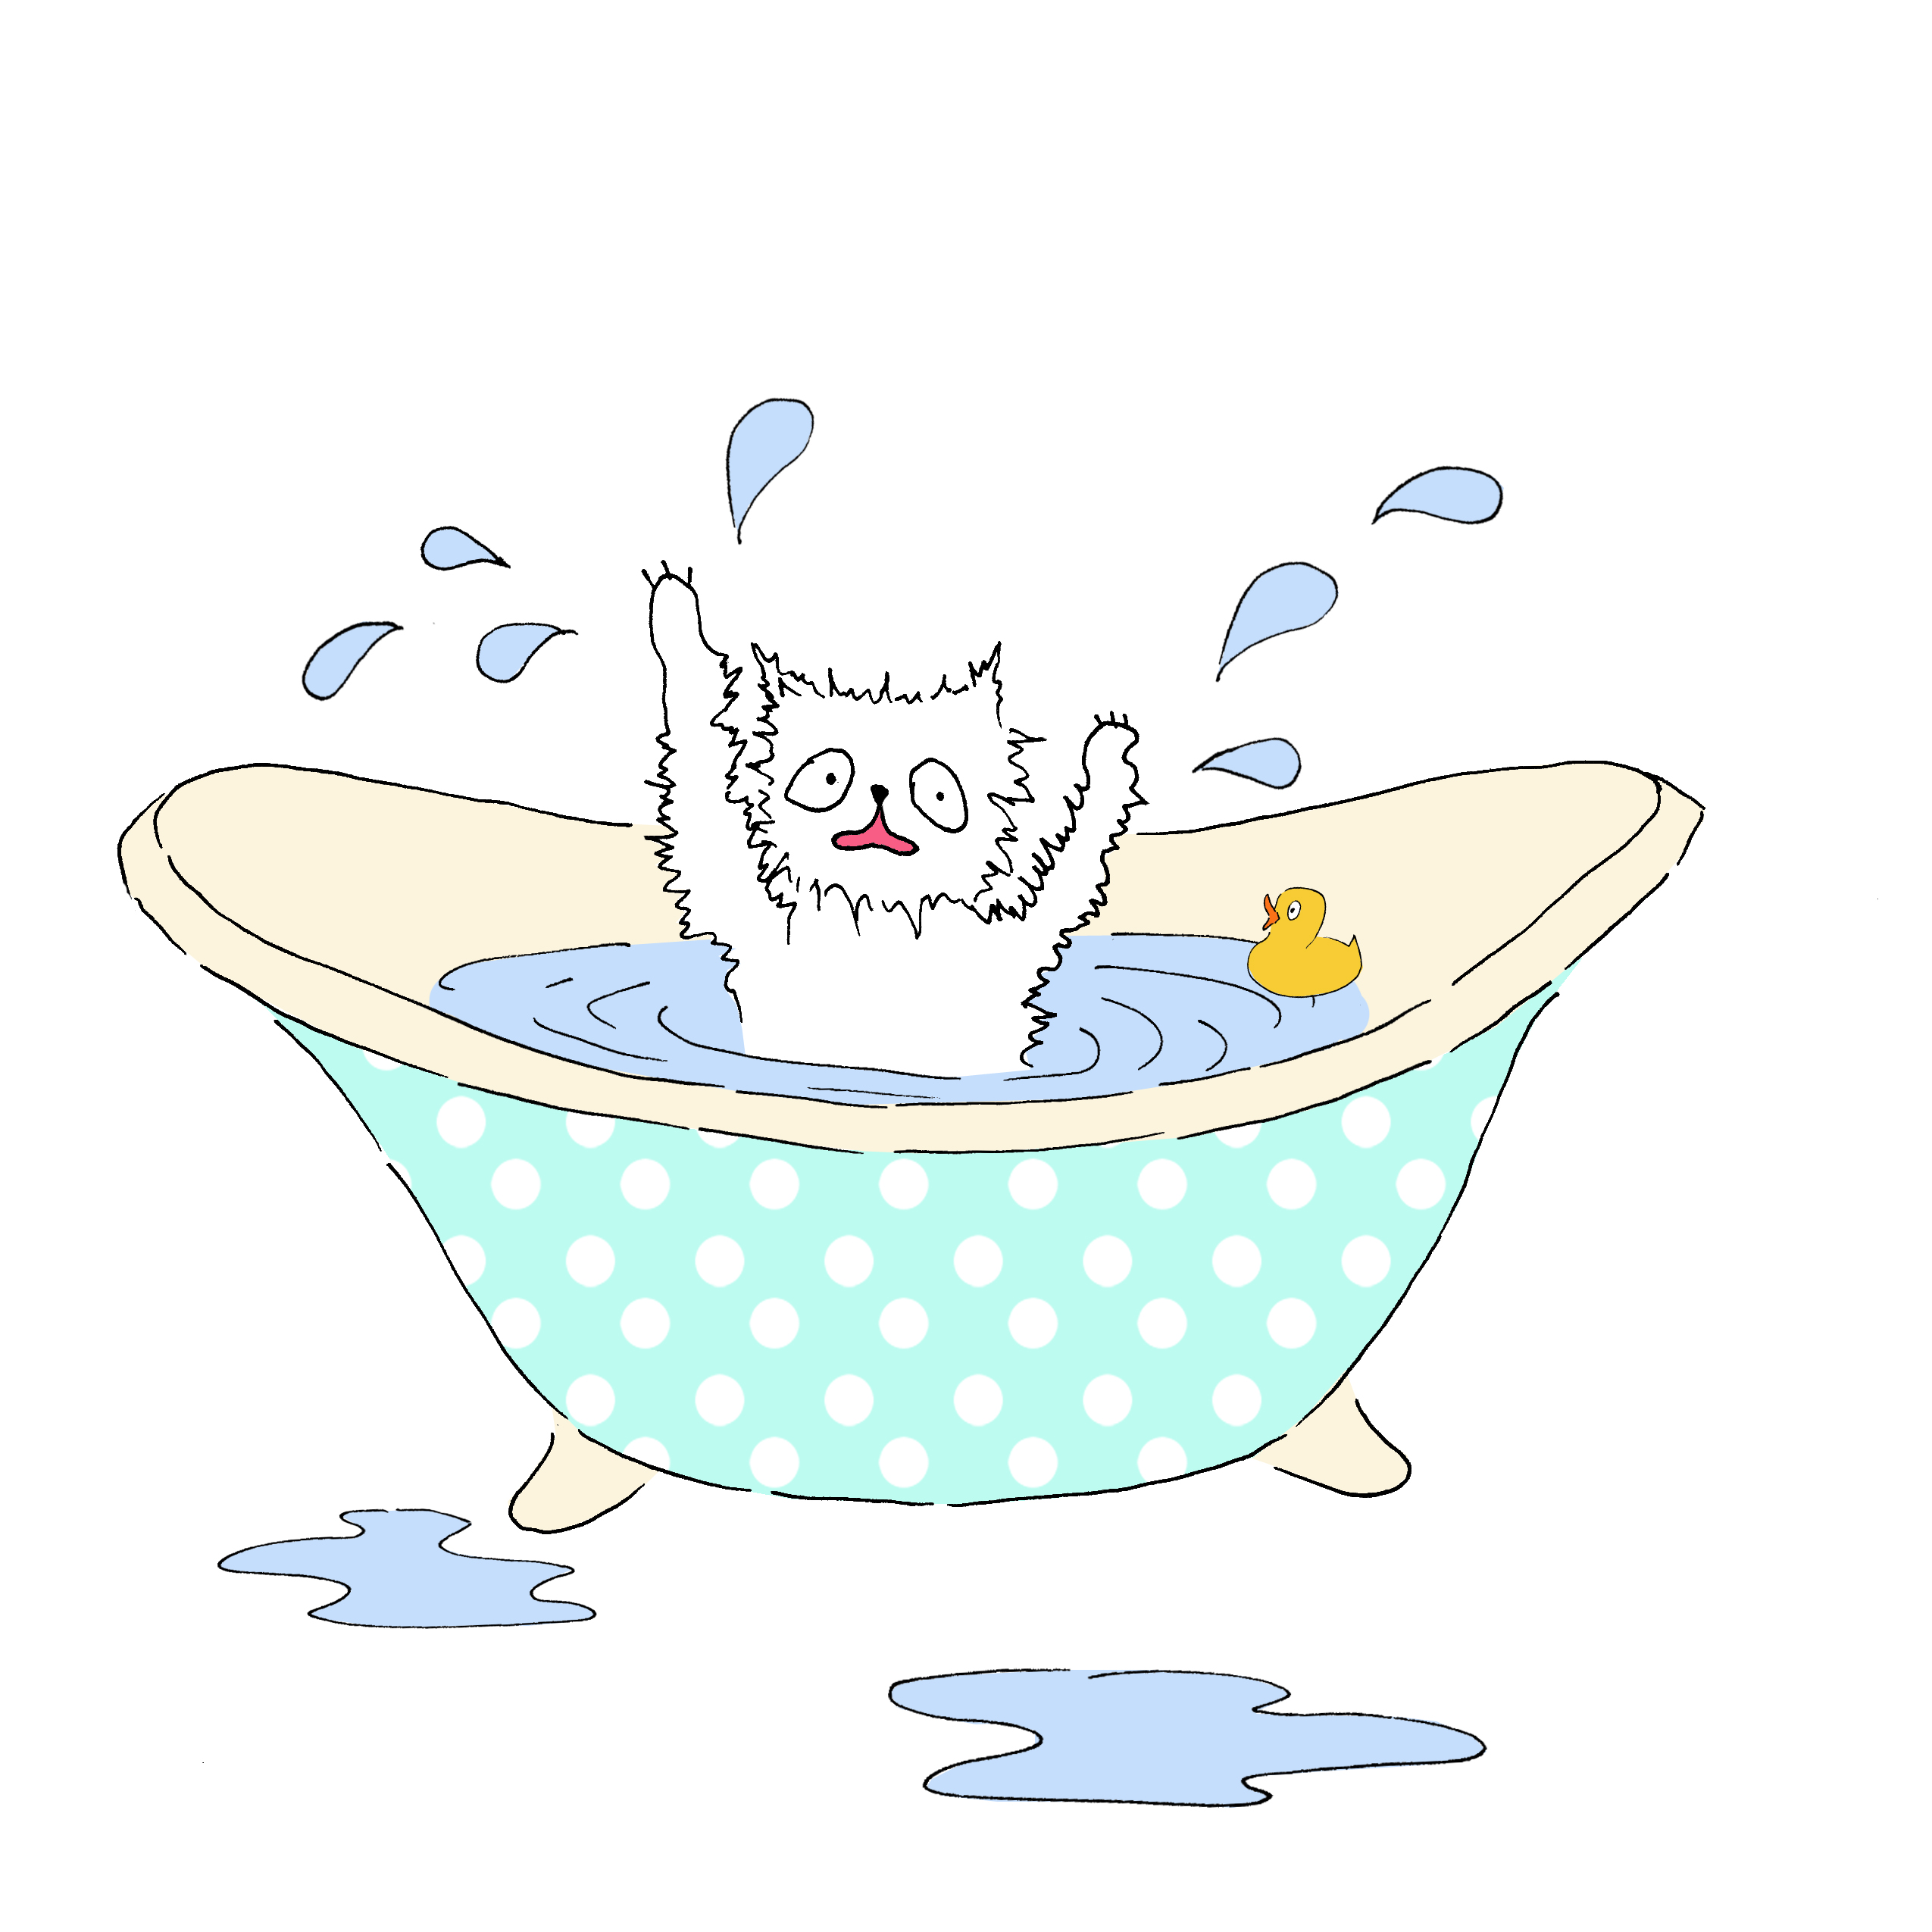 Мими&Китти – 7 – Китти учится плавать by Irena Brodeski - Illustrated by Irena Brodeski - Ourboox.com